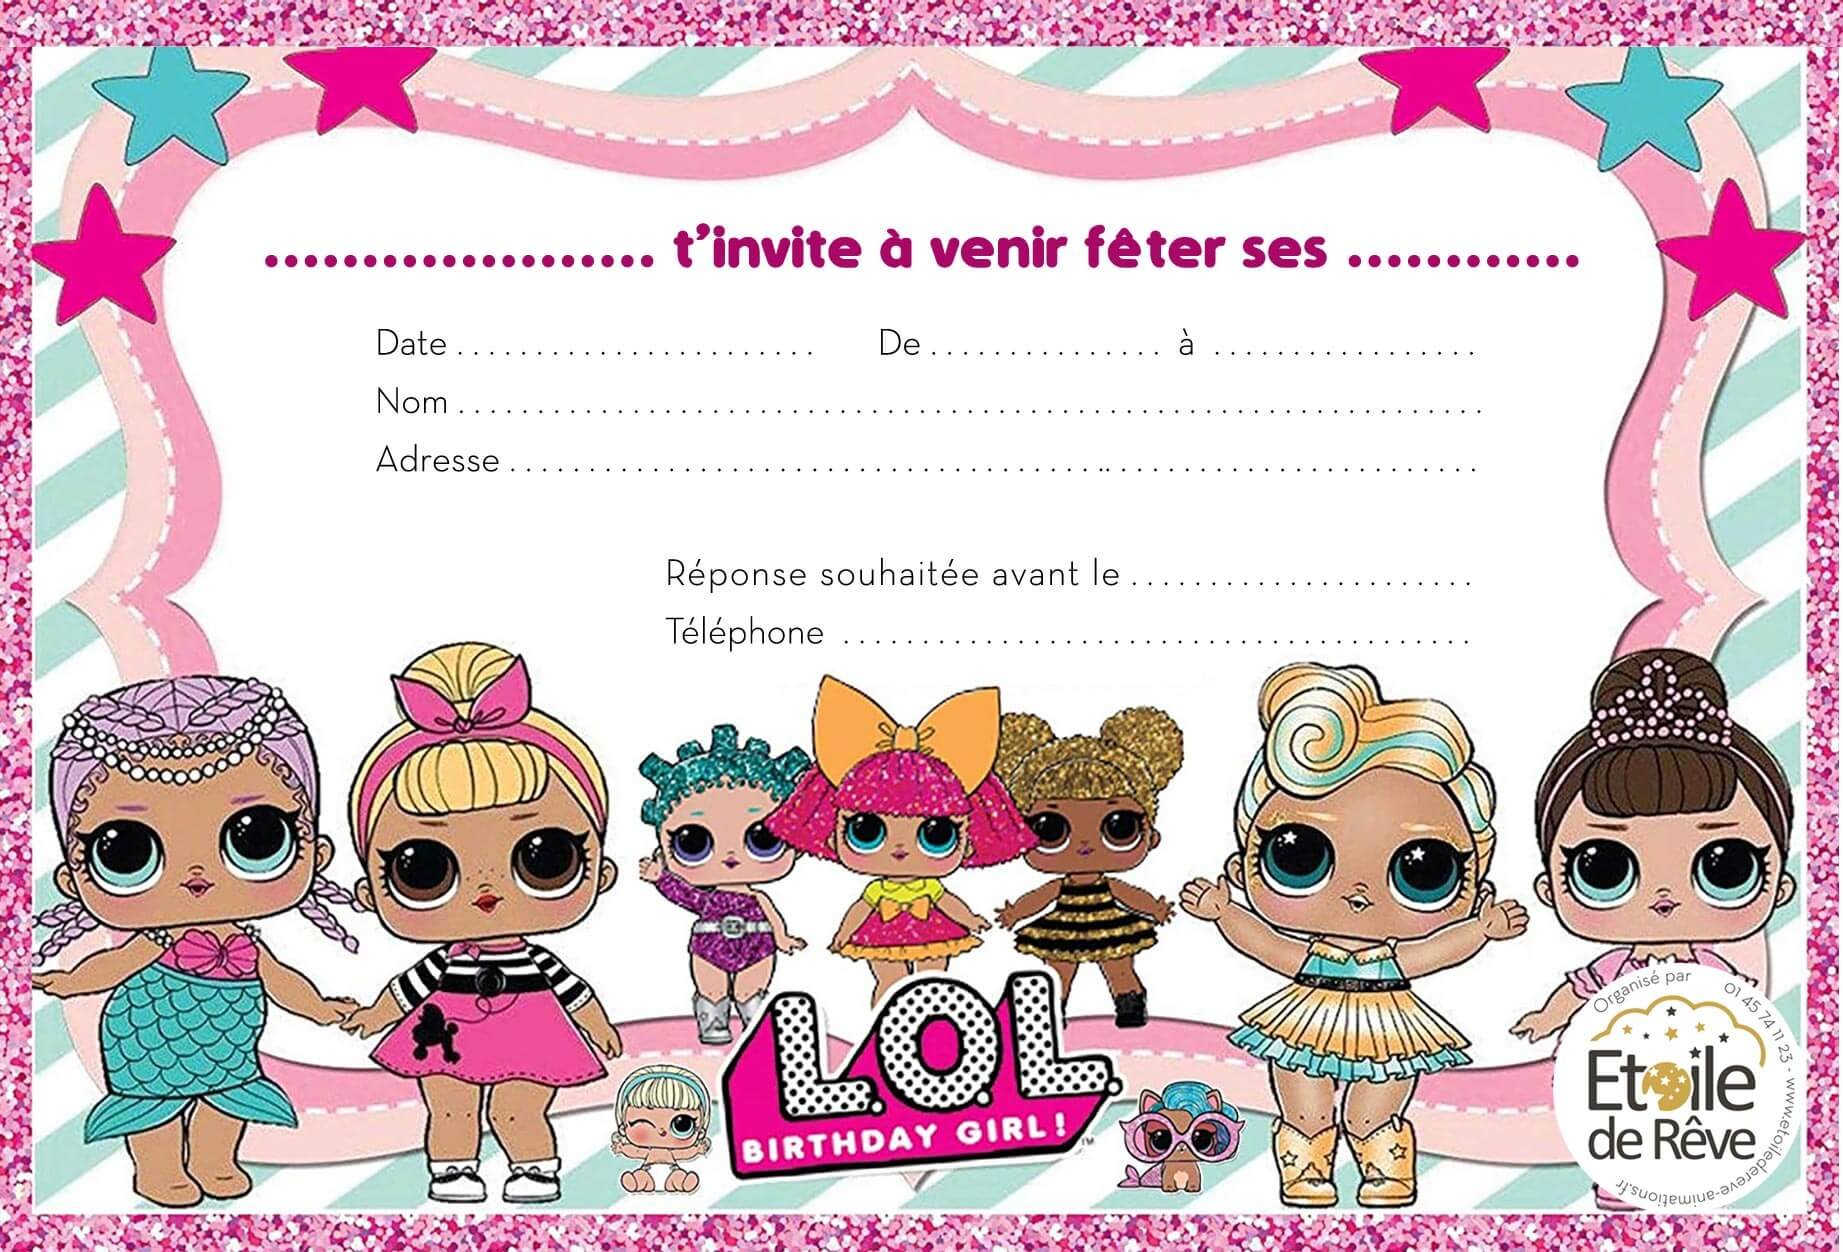 carton-invitation-LOL-Etoile-de-Reve